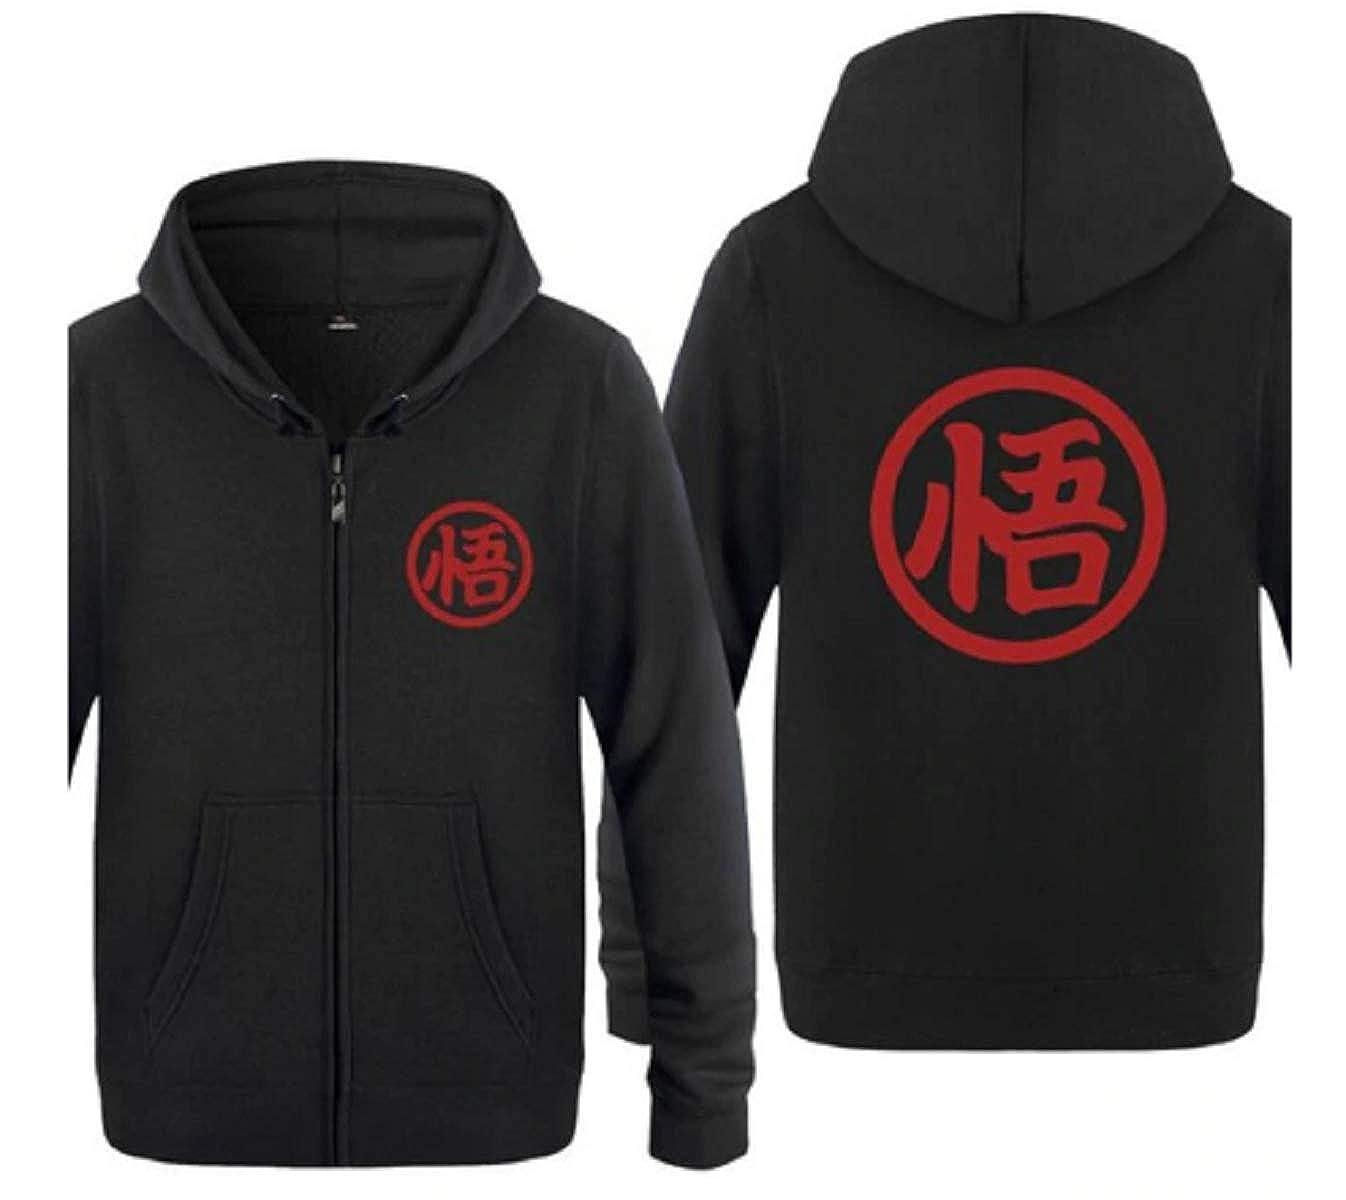 Men Women Girls Boys Tresbon Products Dragon Ball Z Anime Goku Vegeta Hoodie XLarge, Black and Red